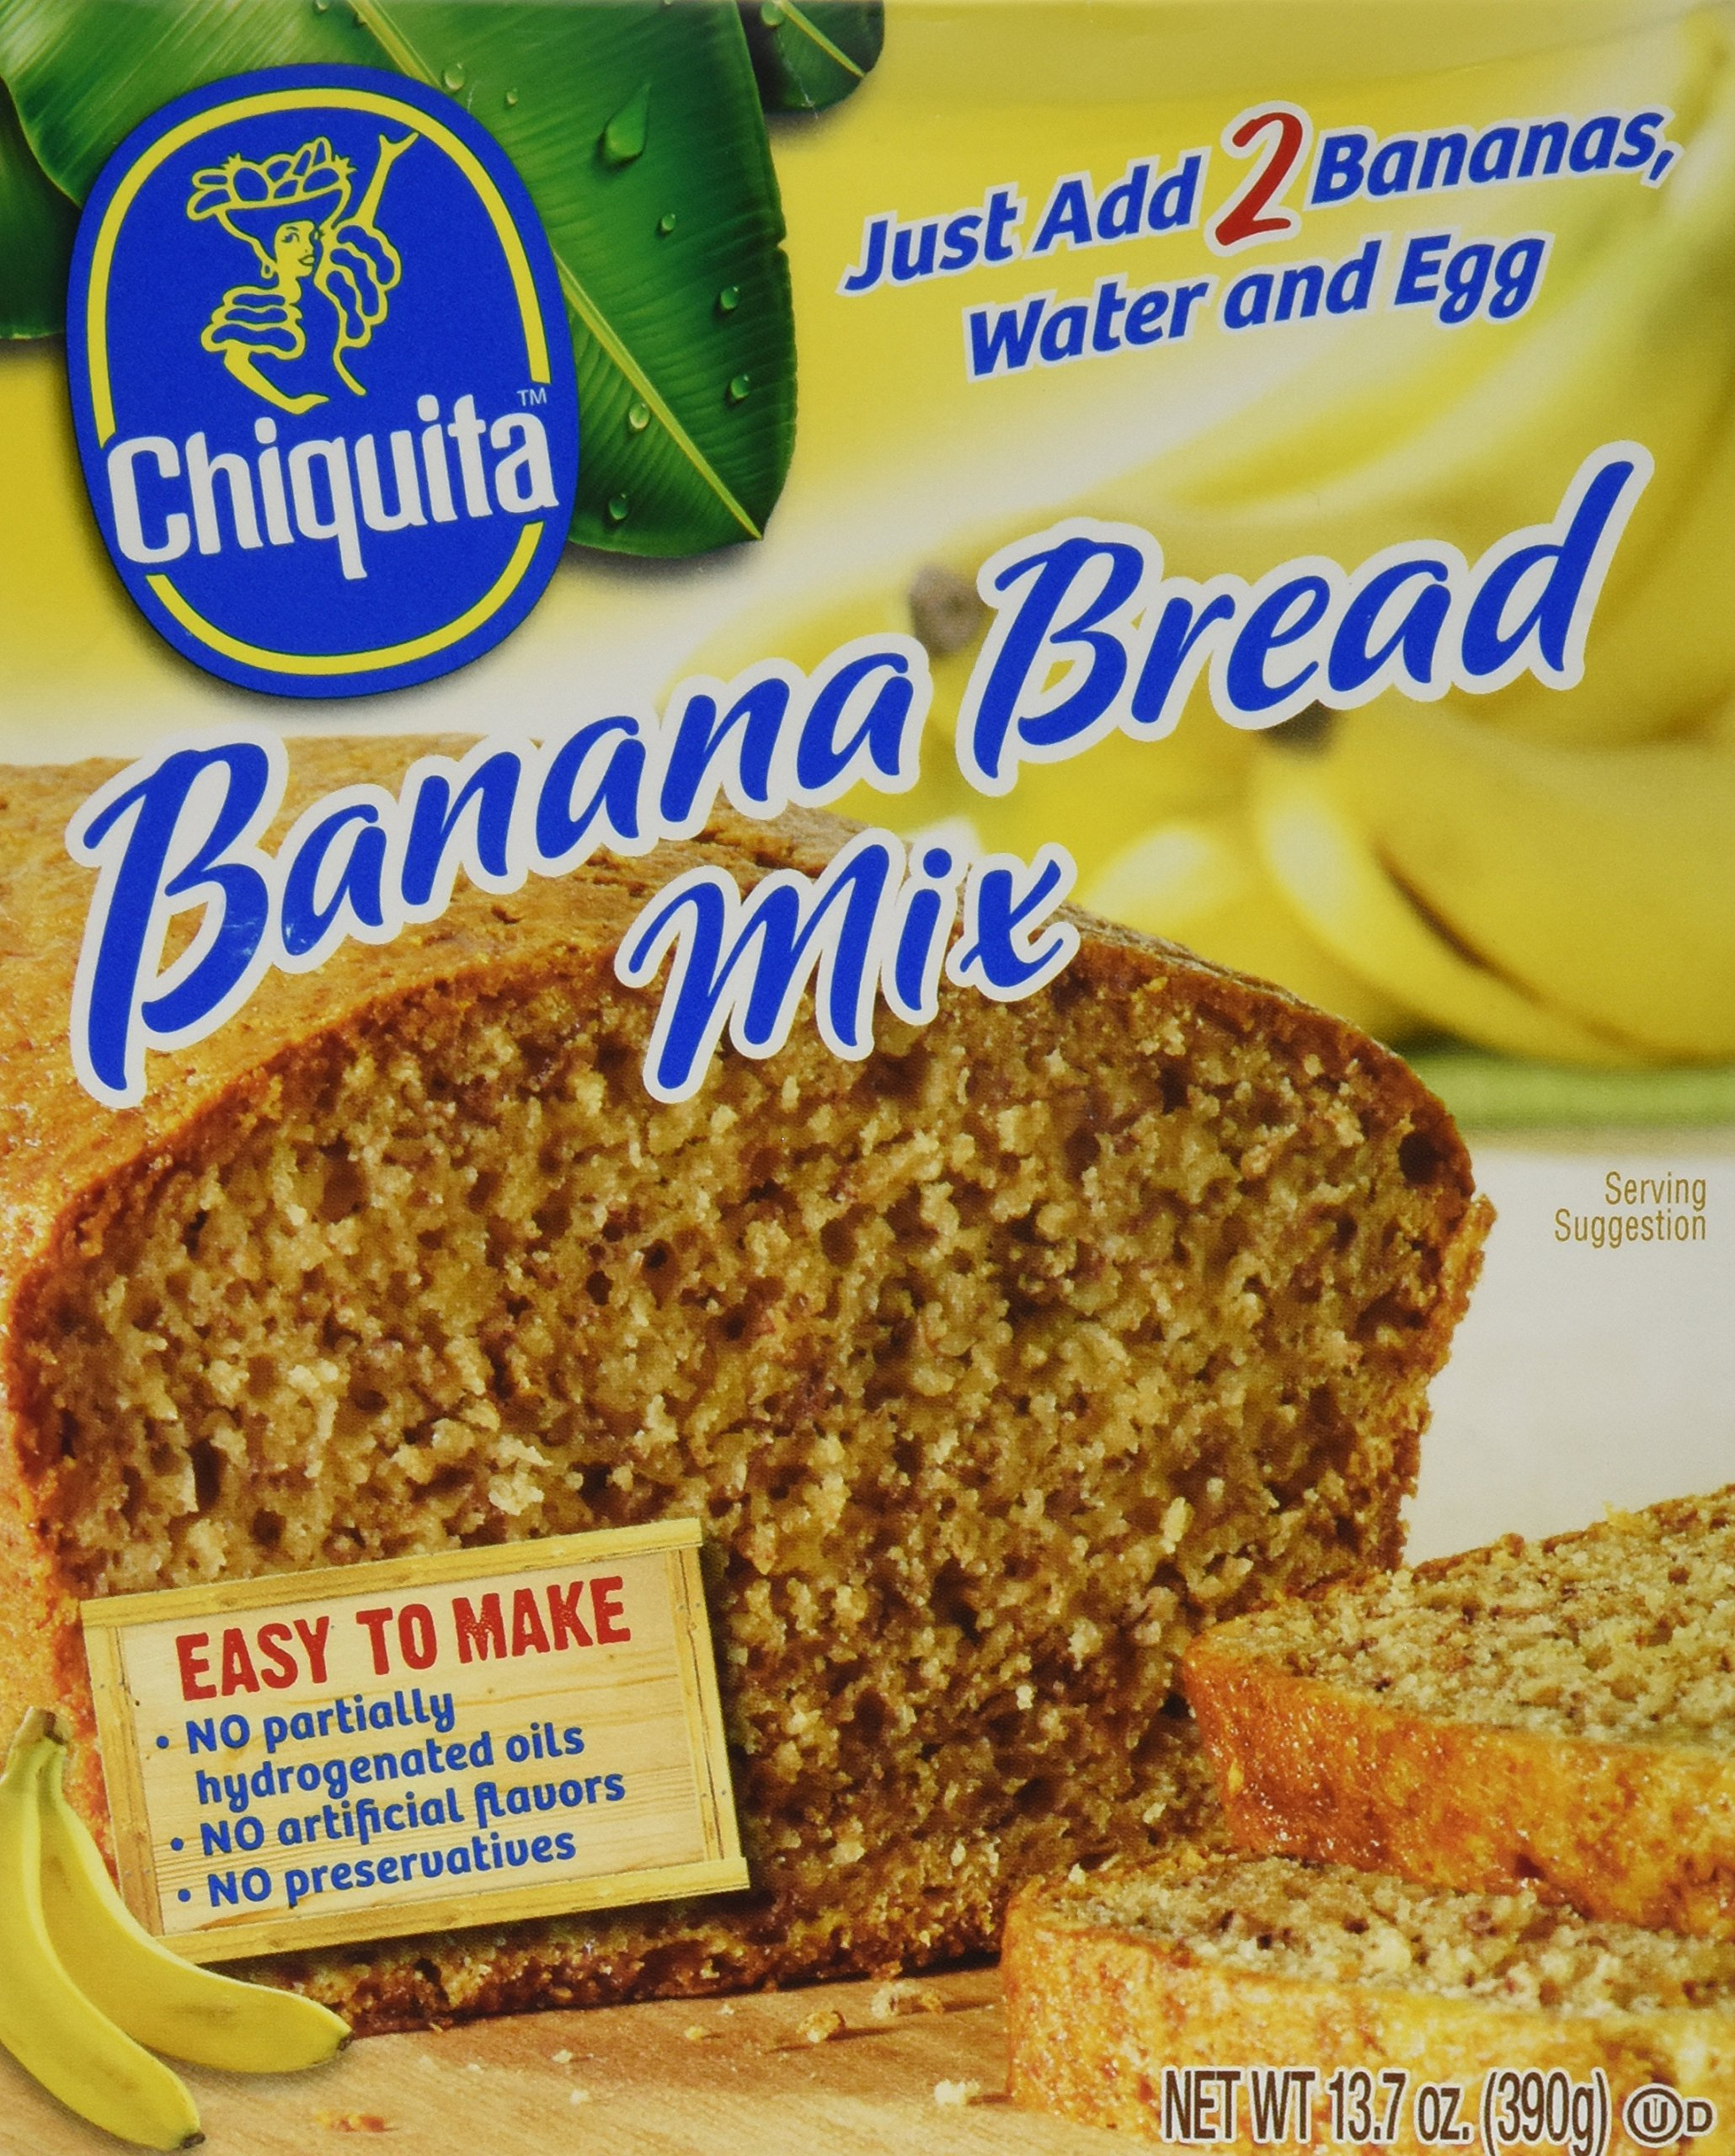 Chiquita Banana Bread Mix - 3 Boxes by Chiquita